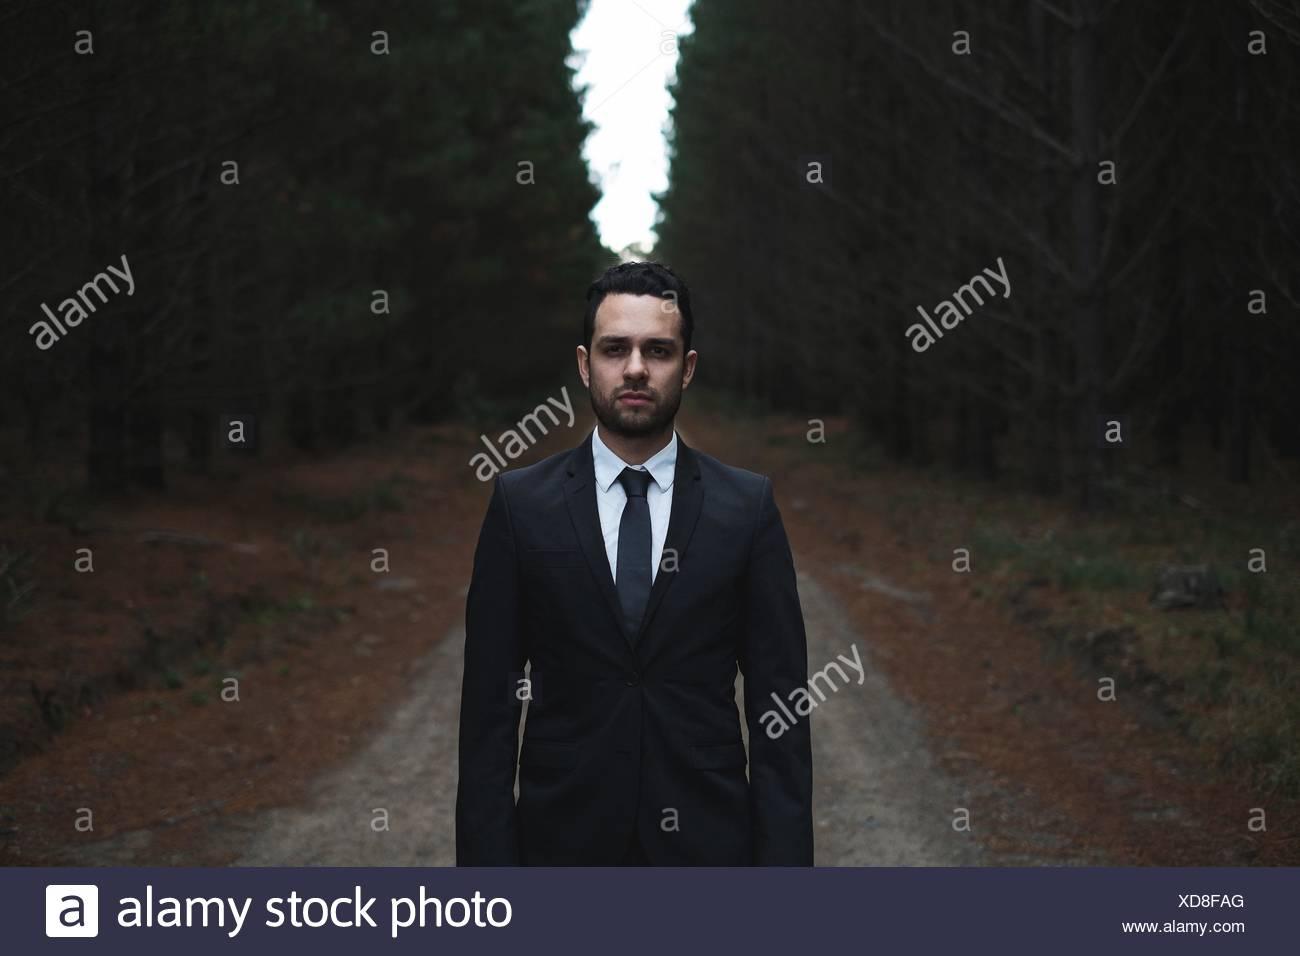 Mann in Anzug im Wald Stockbild